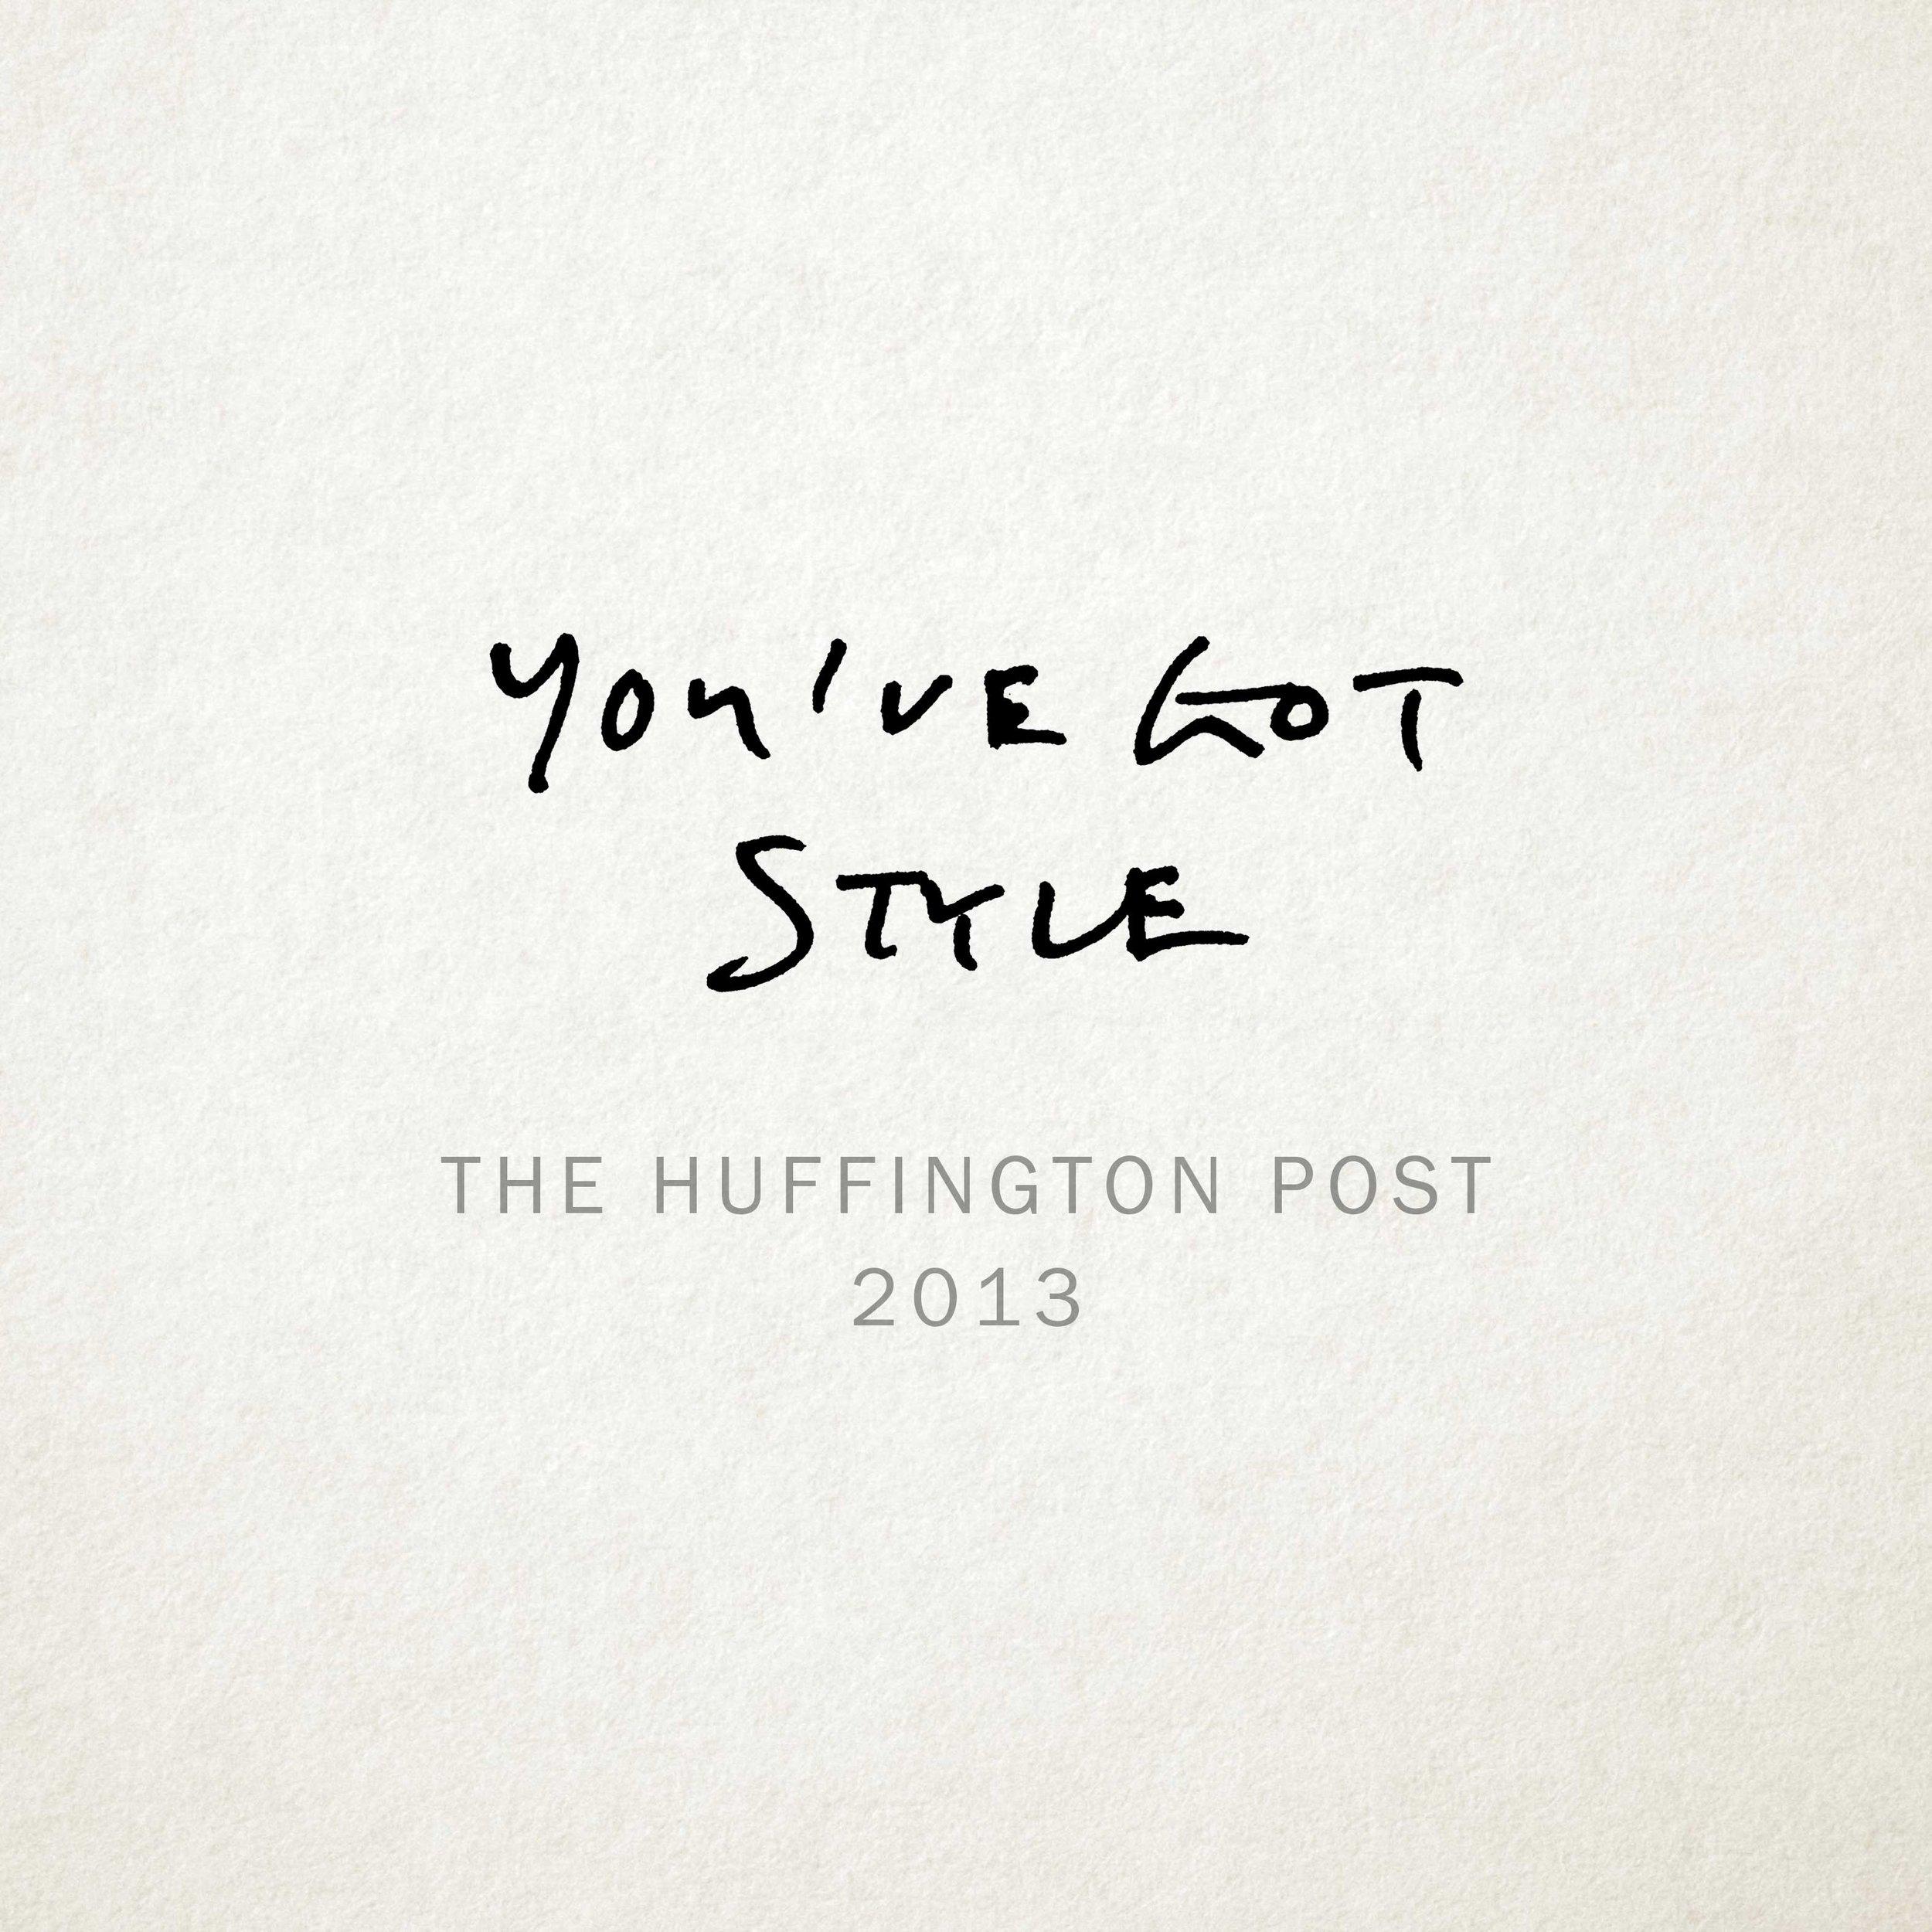 You've Got Style